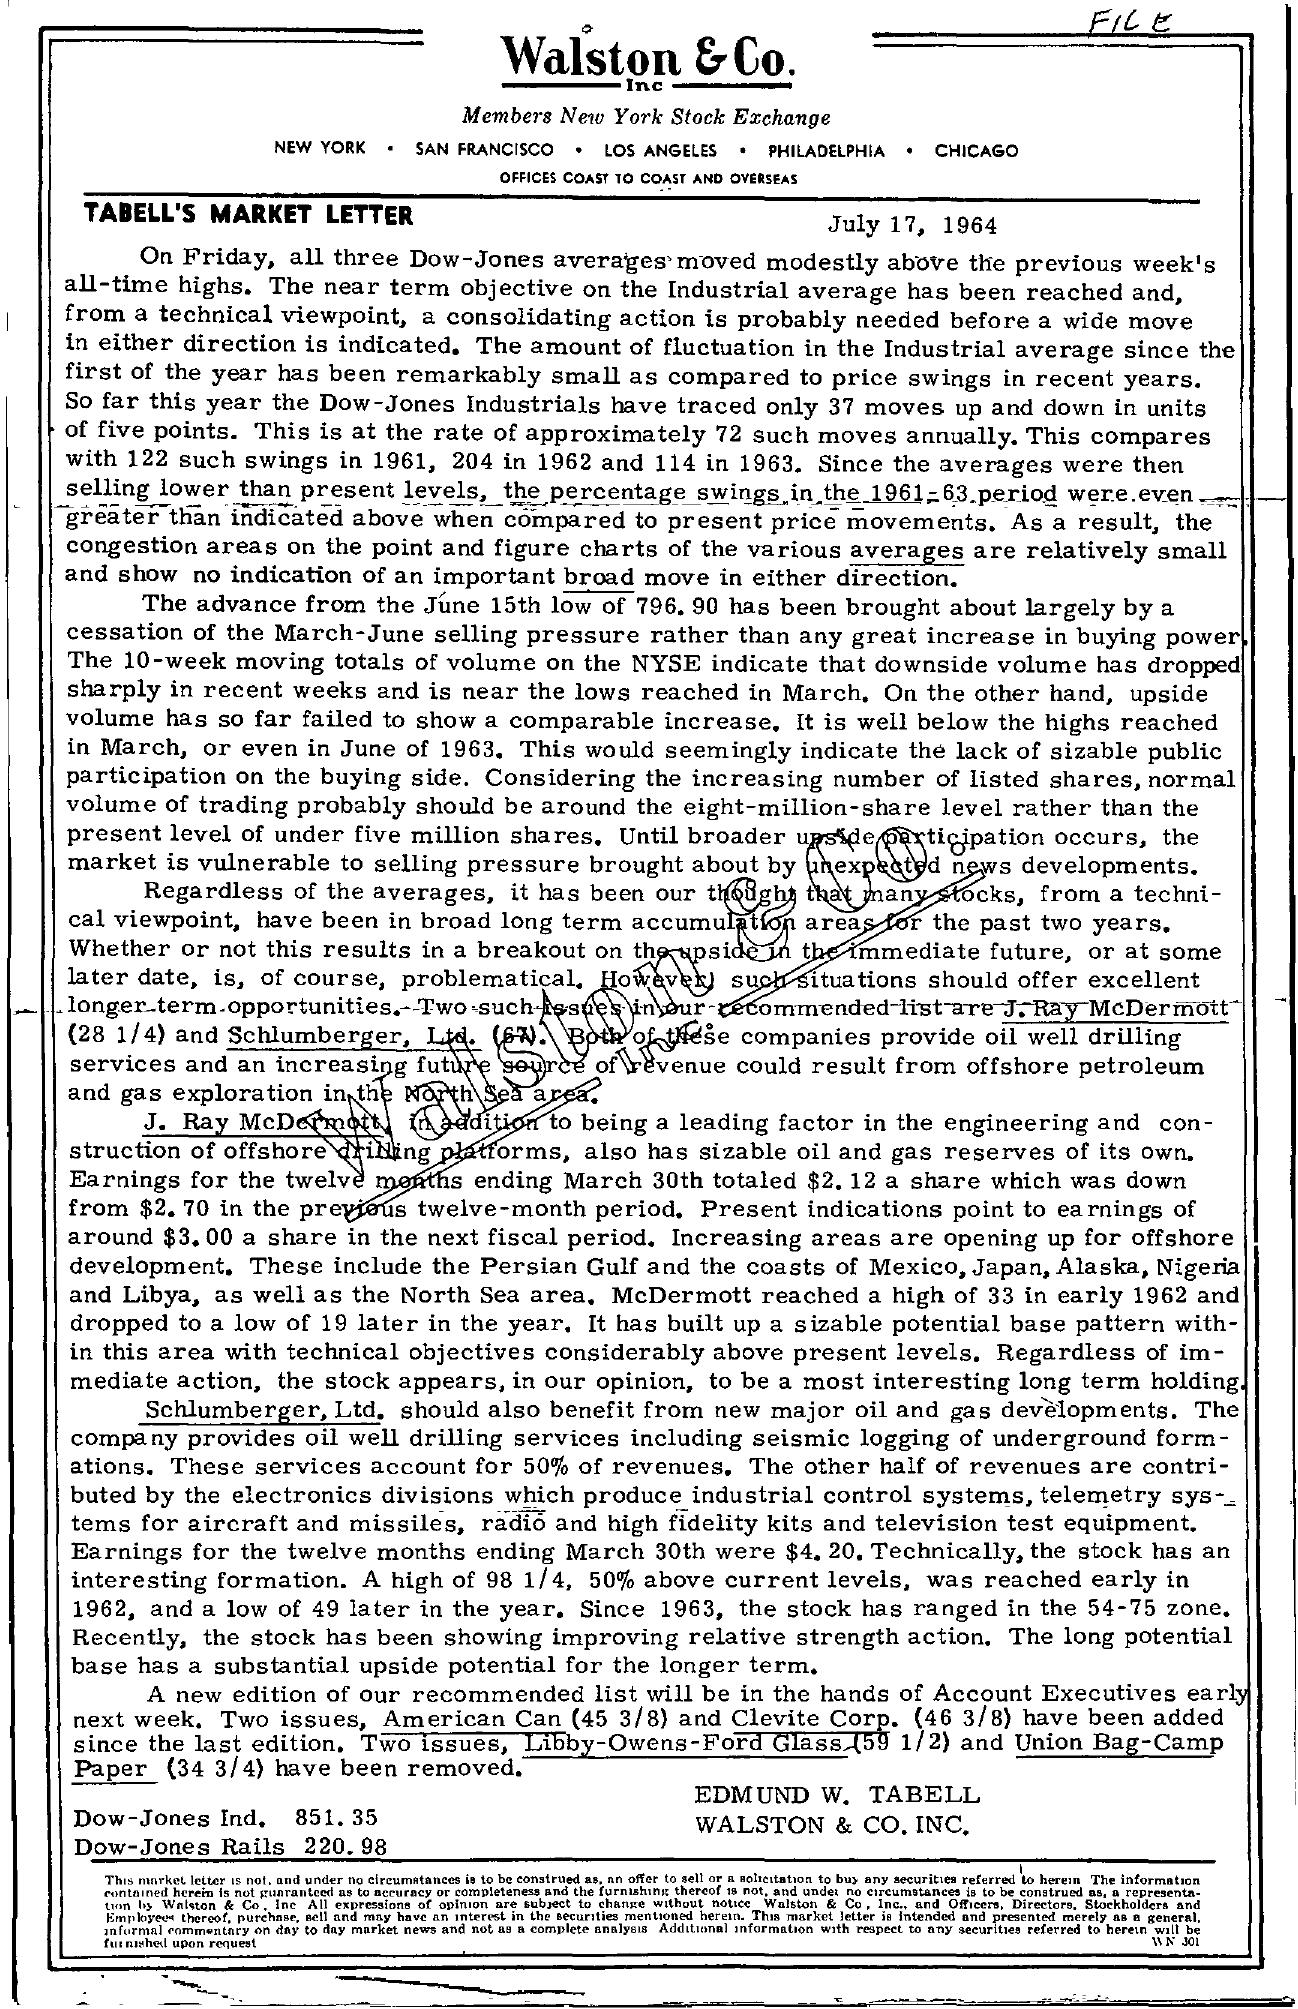 Tabell's Market Letter - July 17, 1964